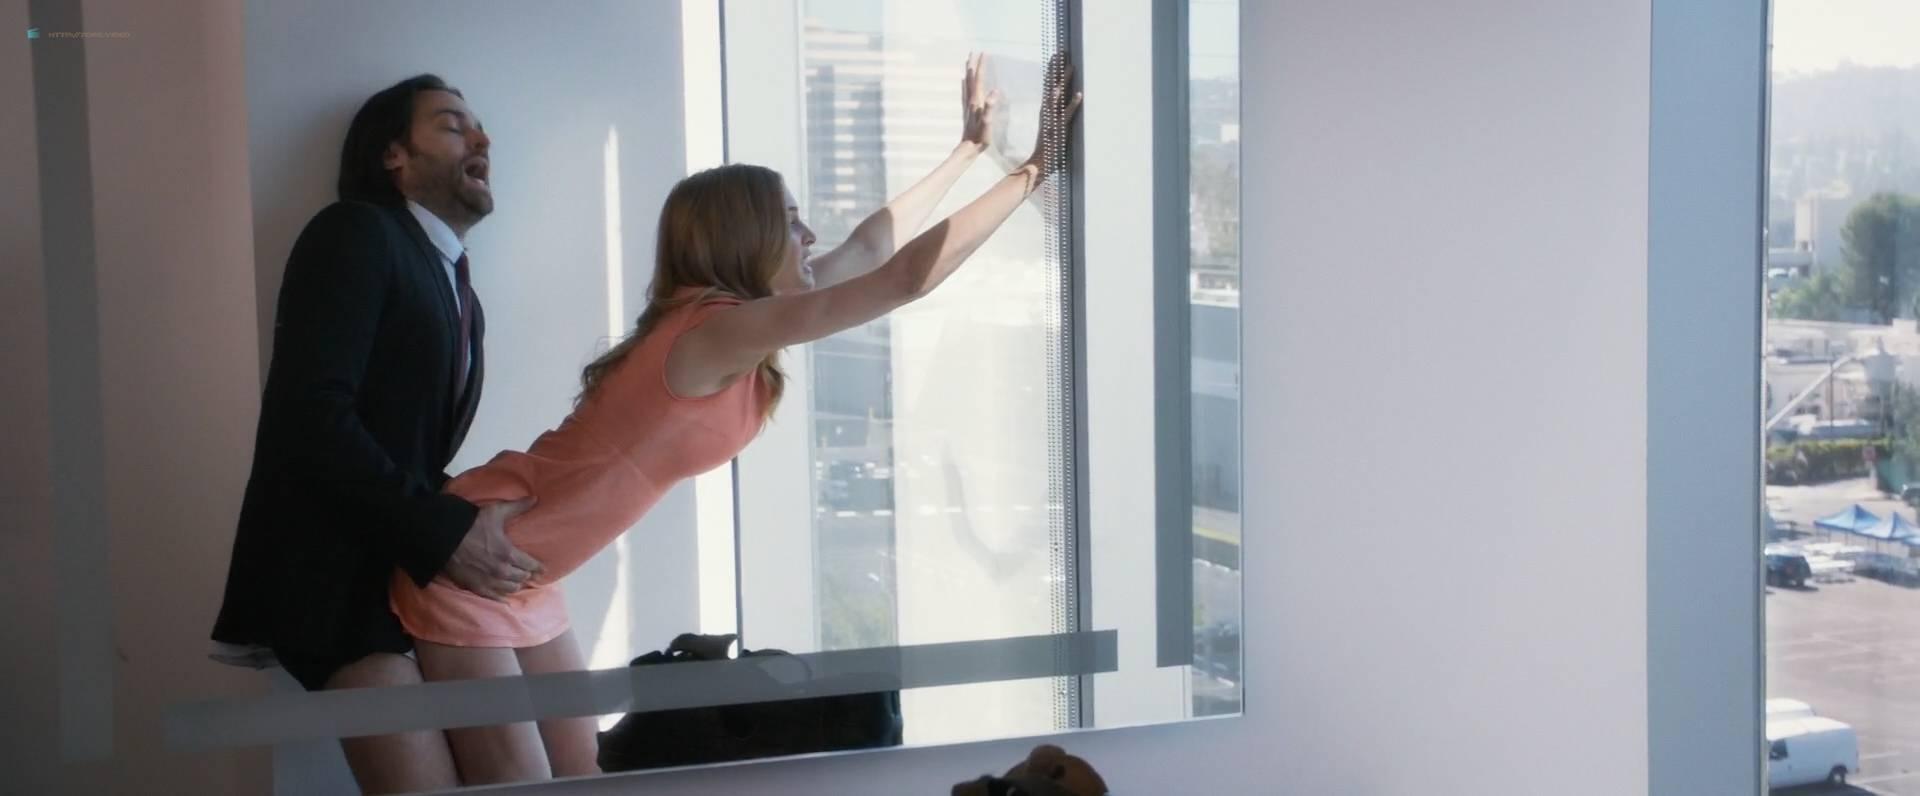 Heather-Graham-nude-sex-Angela-Kinsey-nude-butt-Stephanie-Beatriz-hot-Half-Magic-2018-HD-1080p-002.jpg